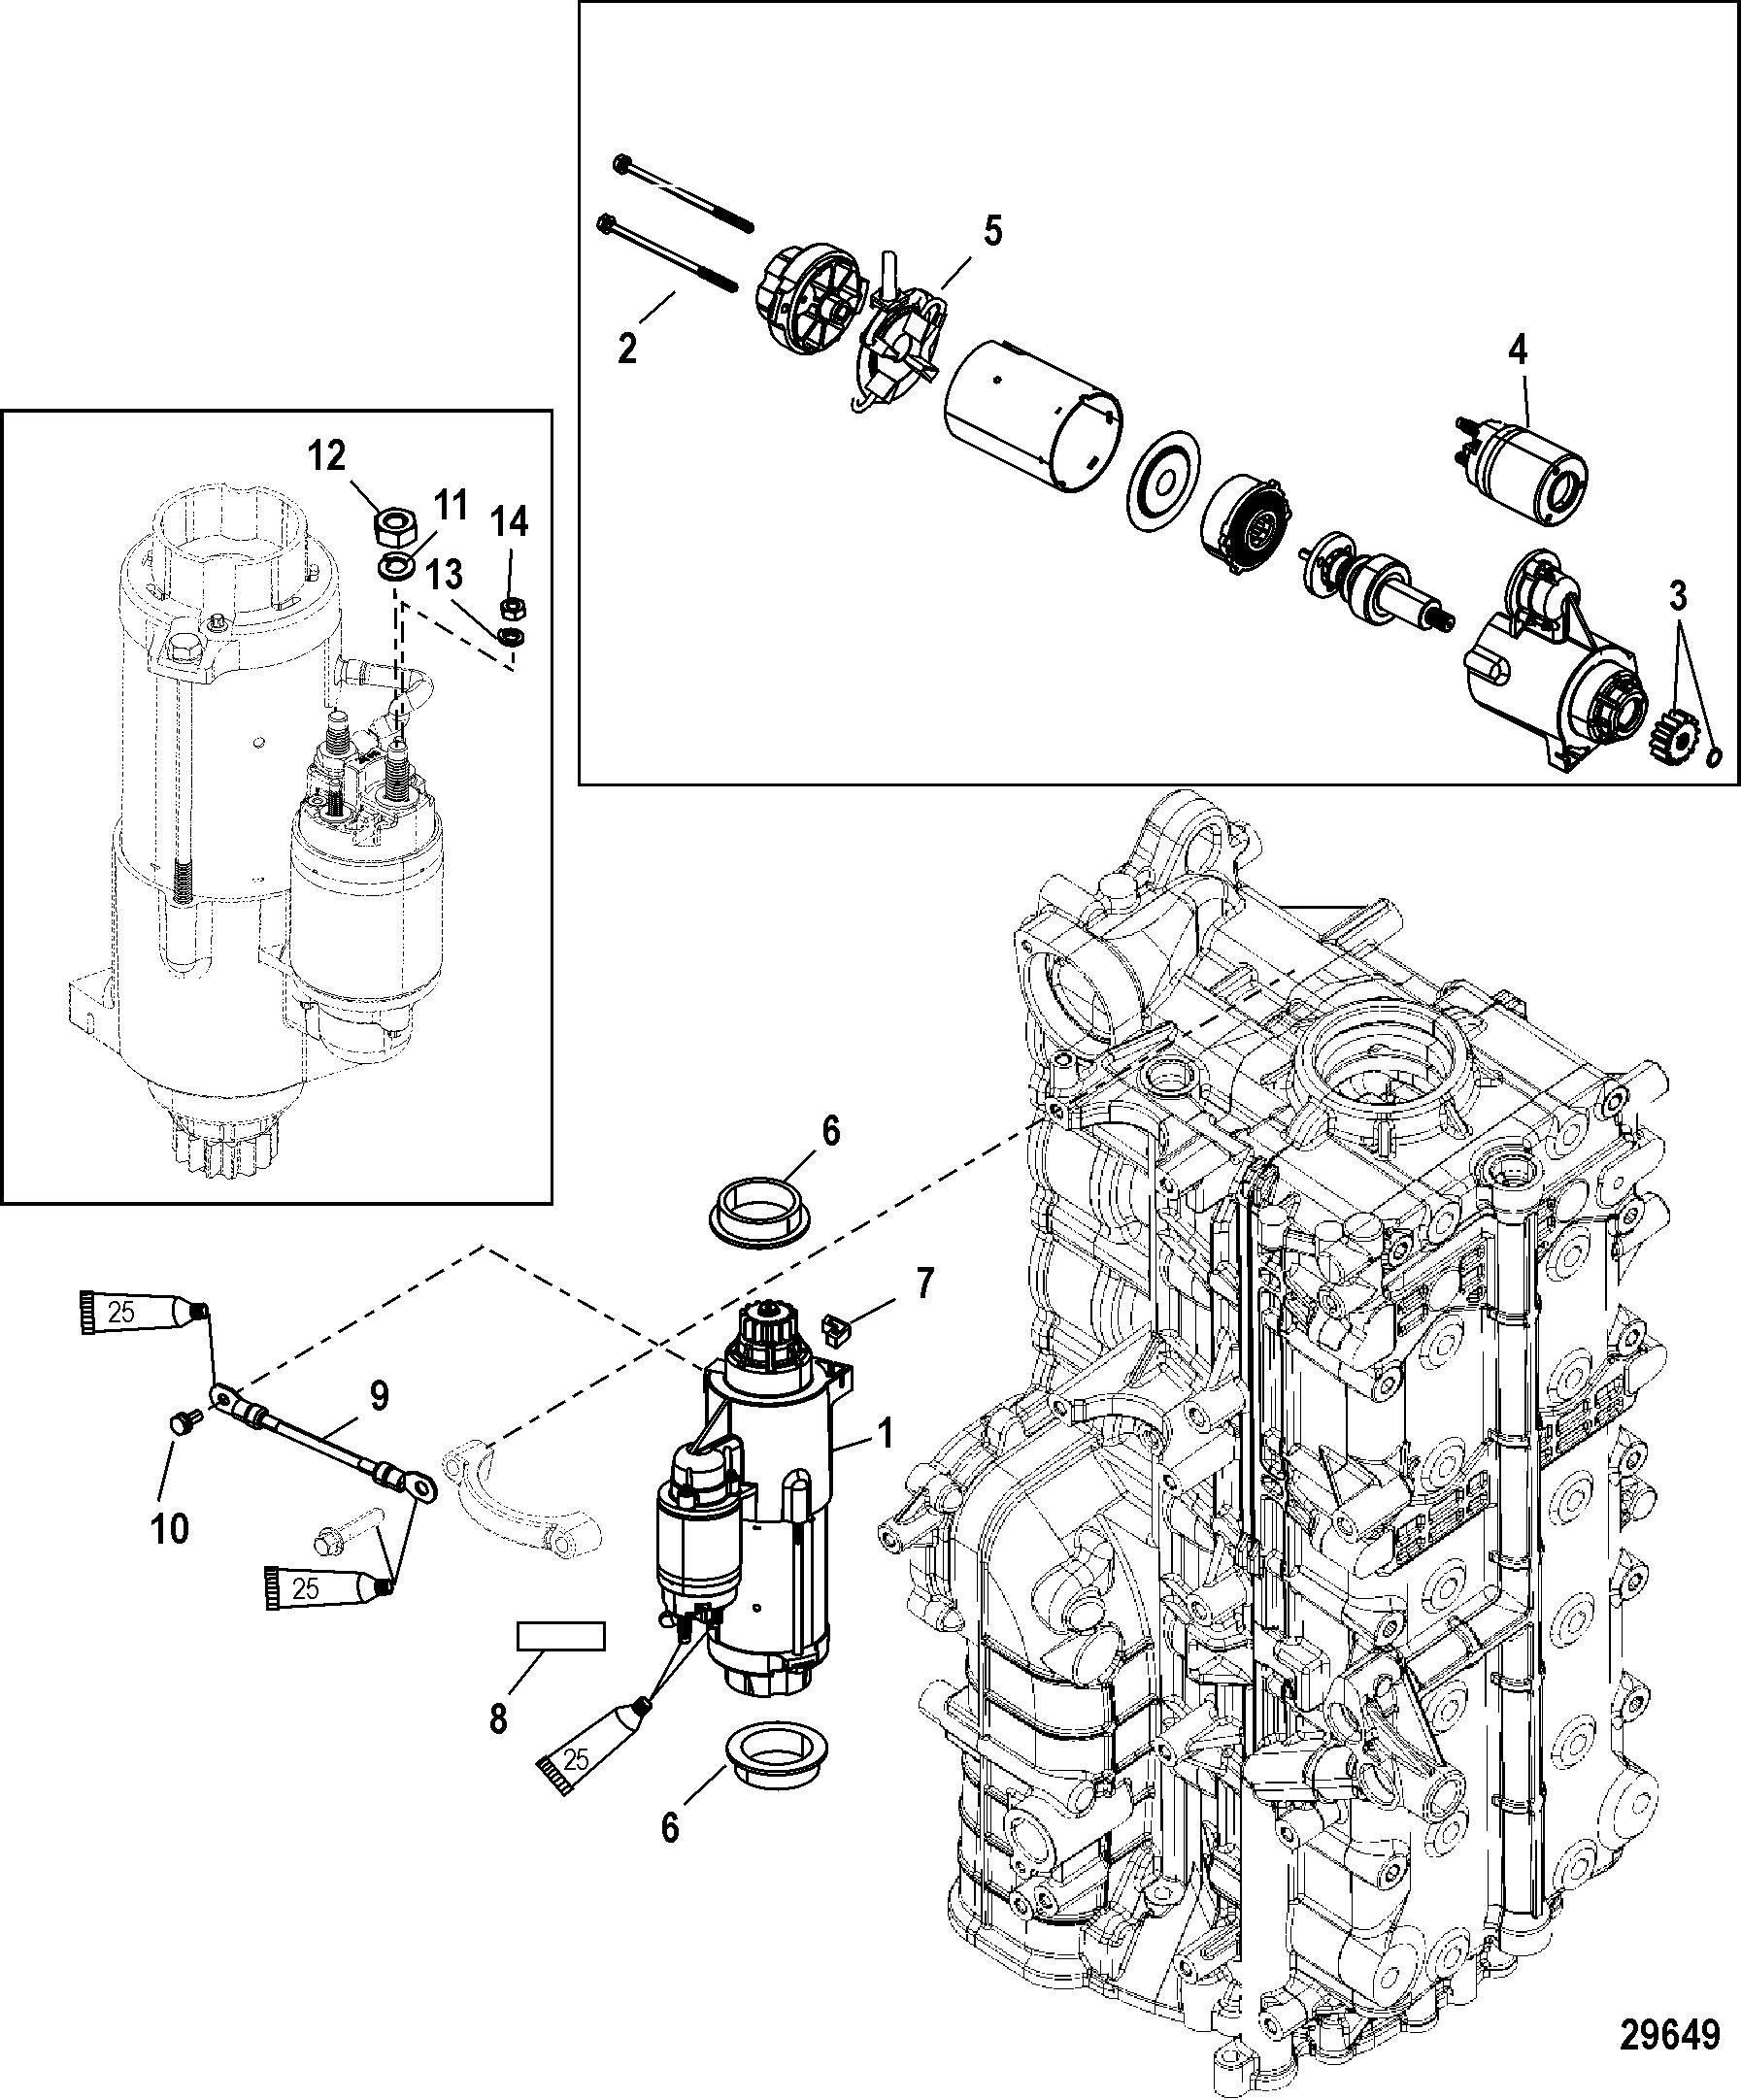 Starter Motor FOR MERCURY 250/300 PRO 4-STROKE VERADO 6